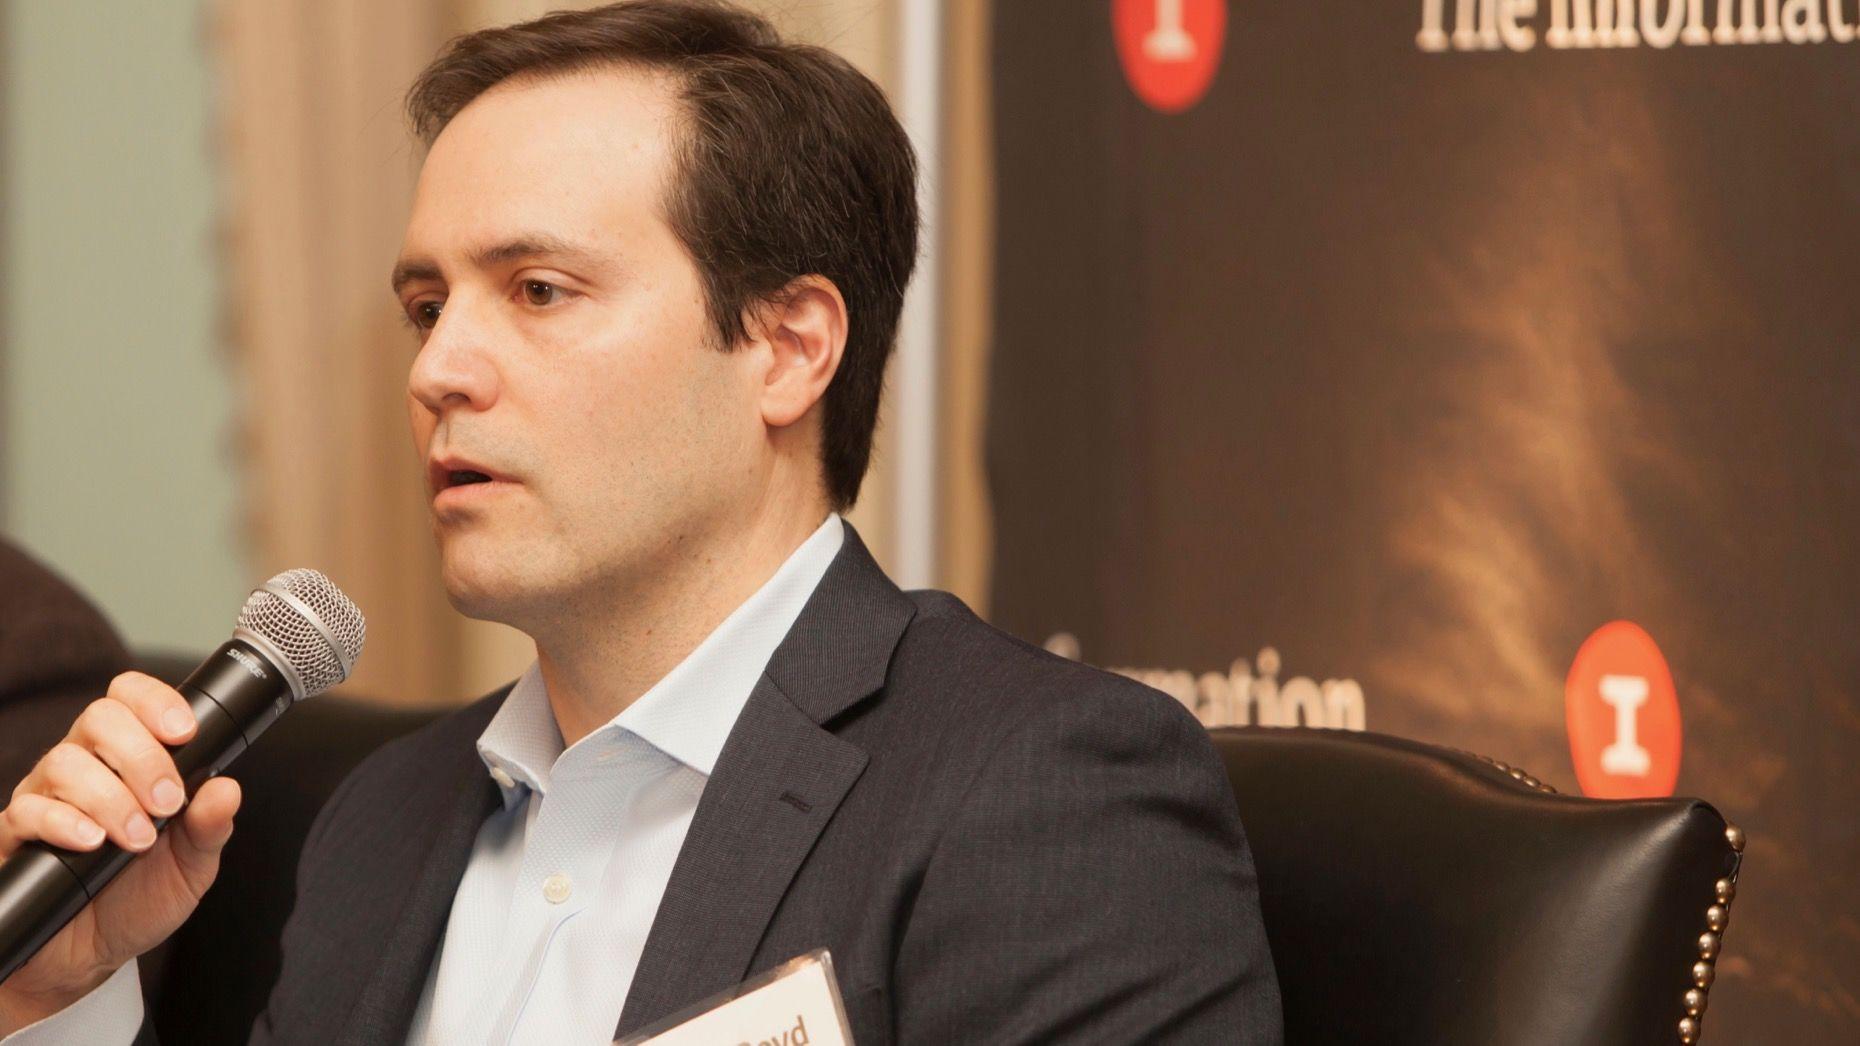 Fidelity Executive Who Backed Uber, WeWork, to Depart